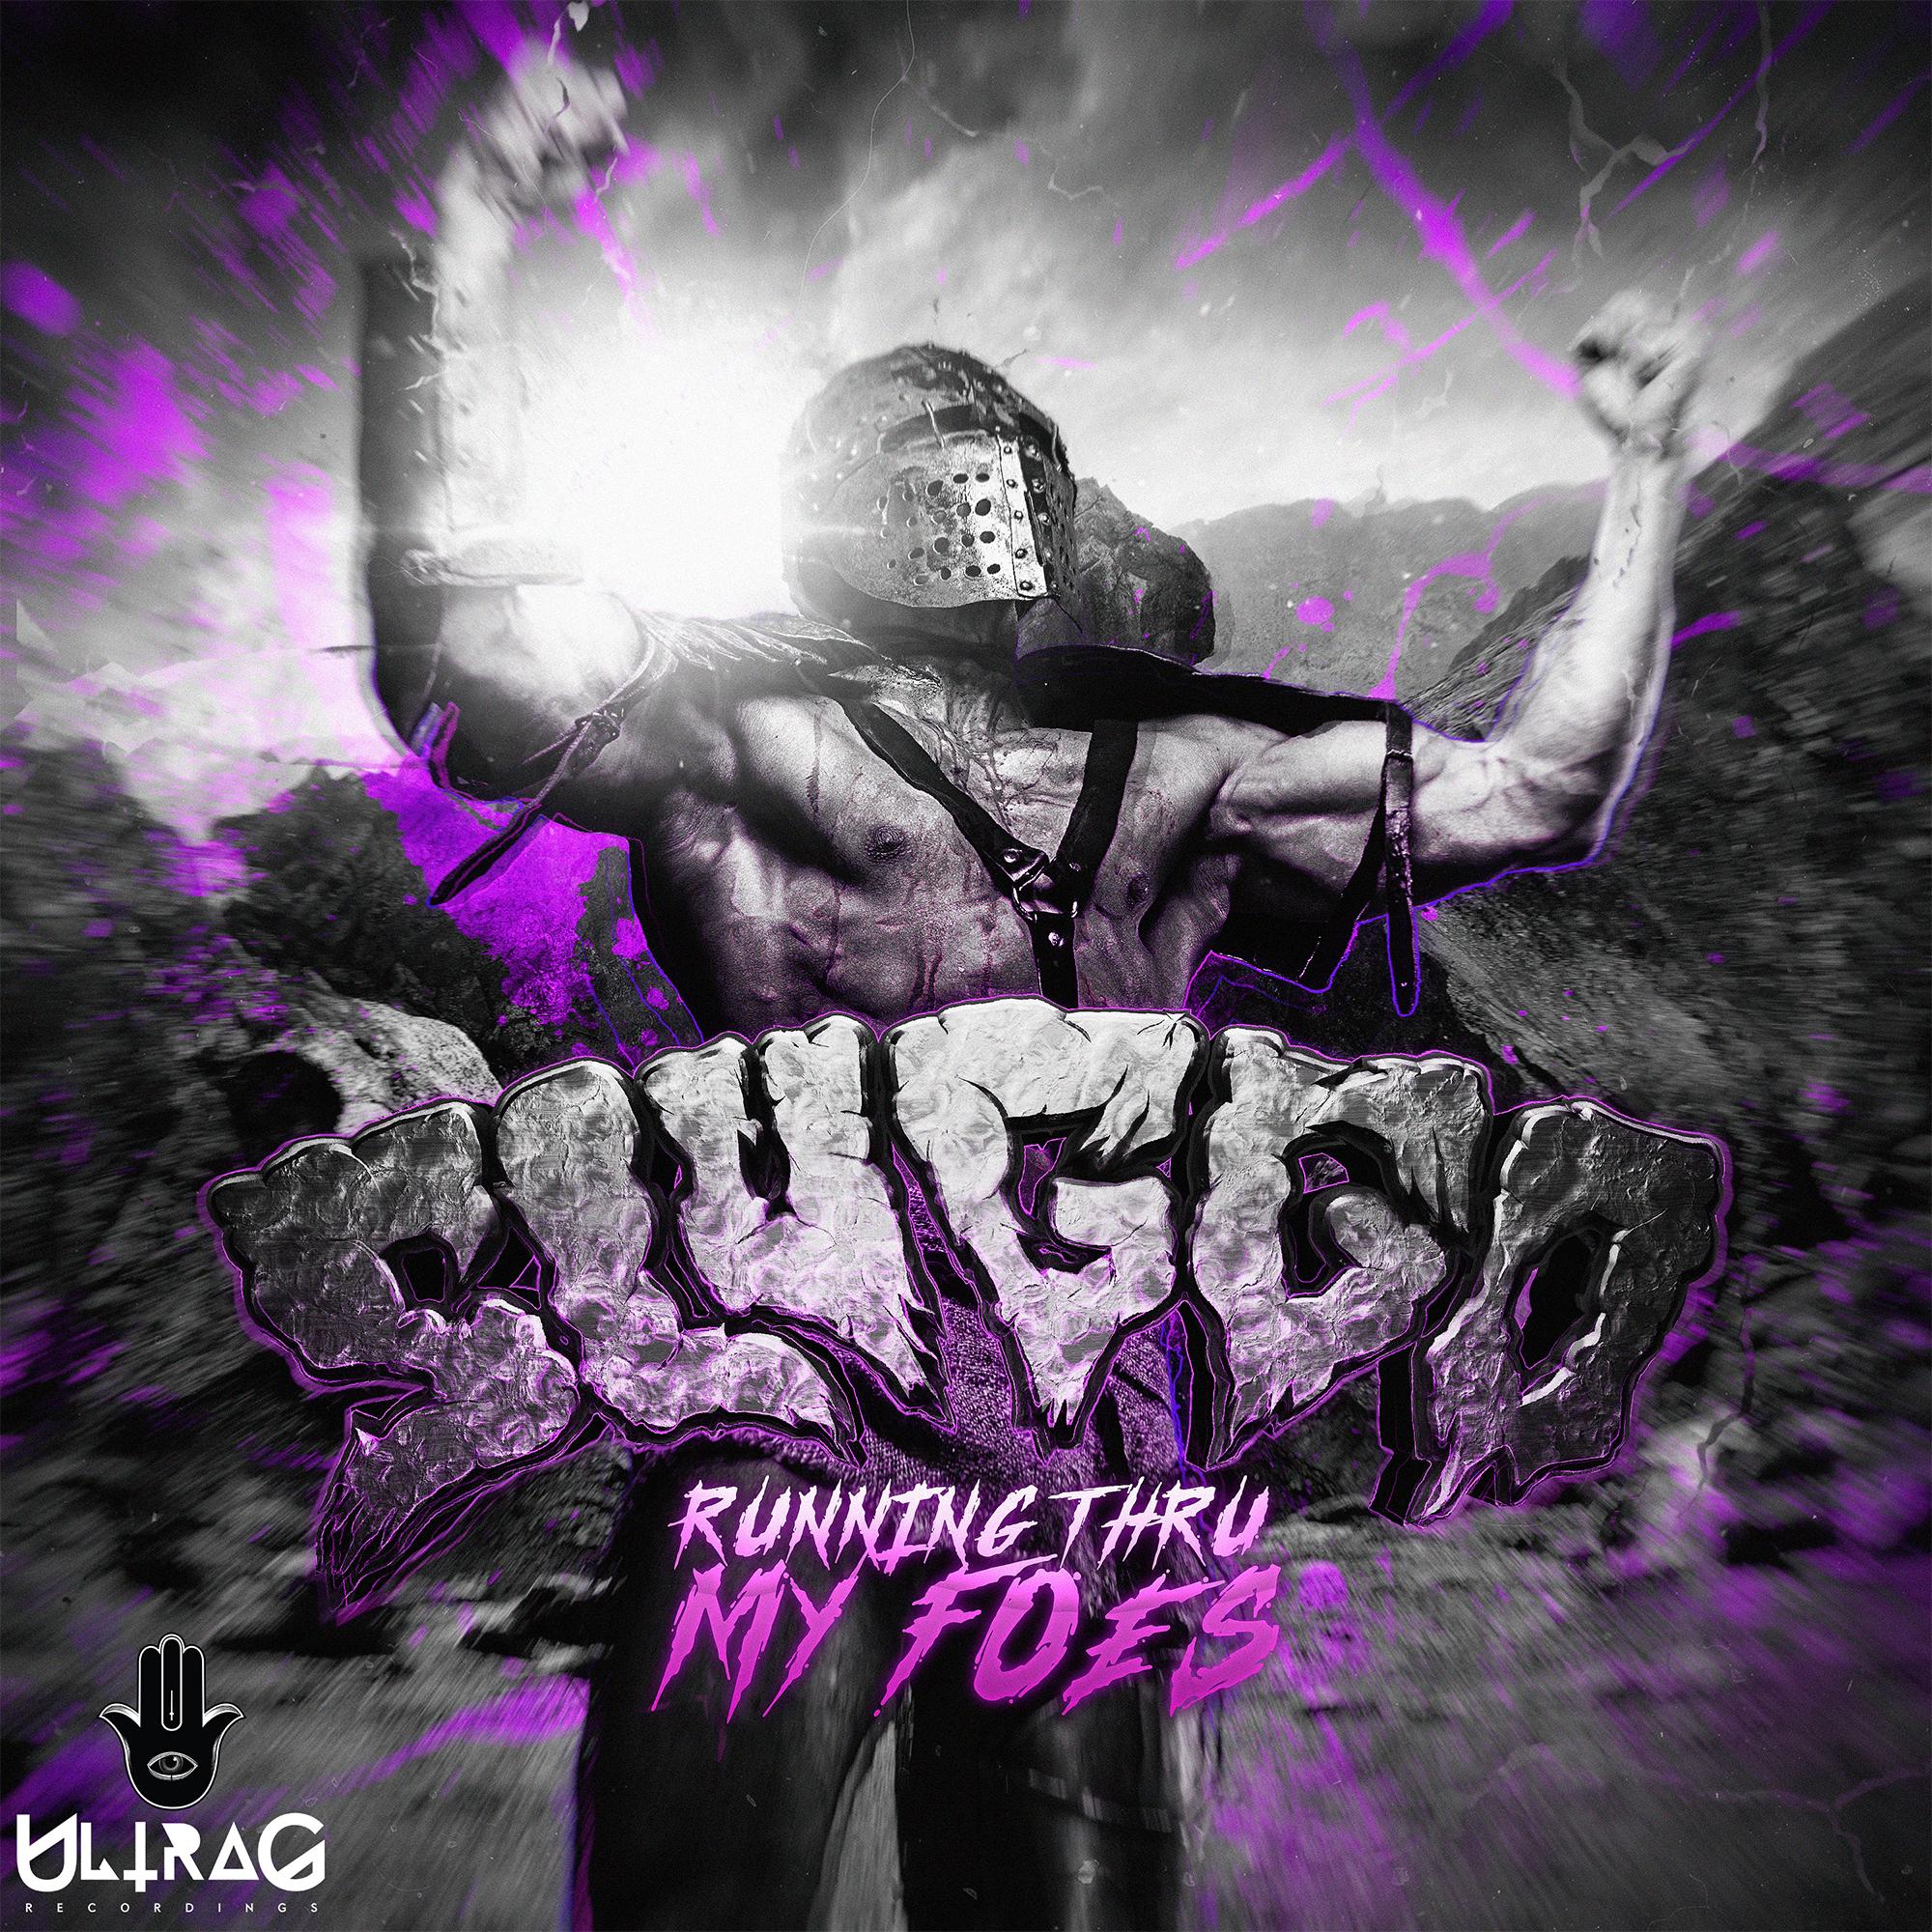 Sluggo - Running thru my foes 2000x2000 JPG.jpg